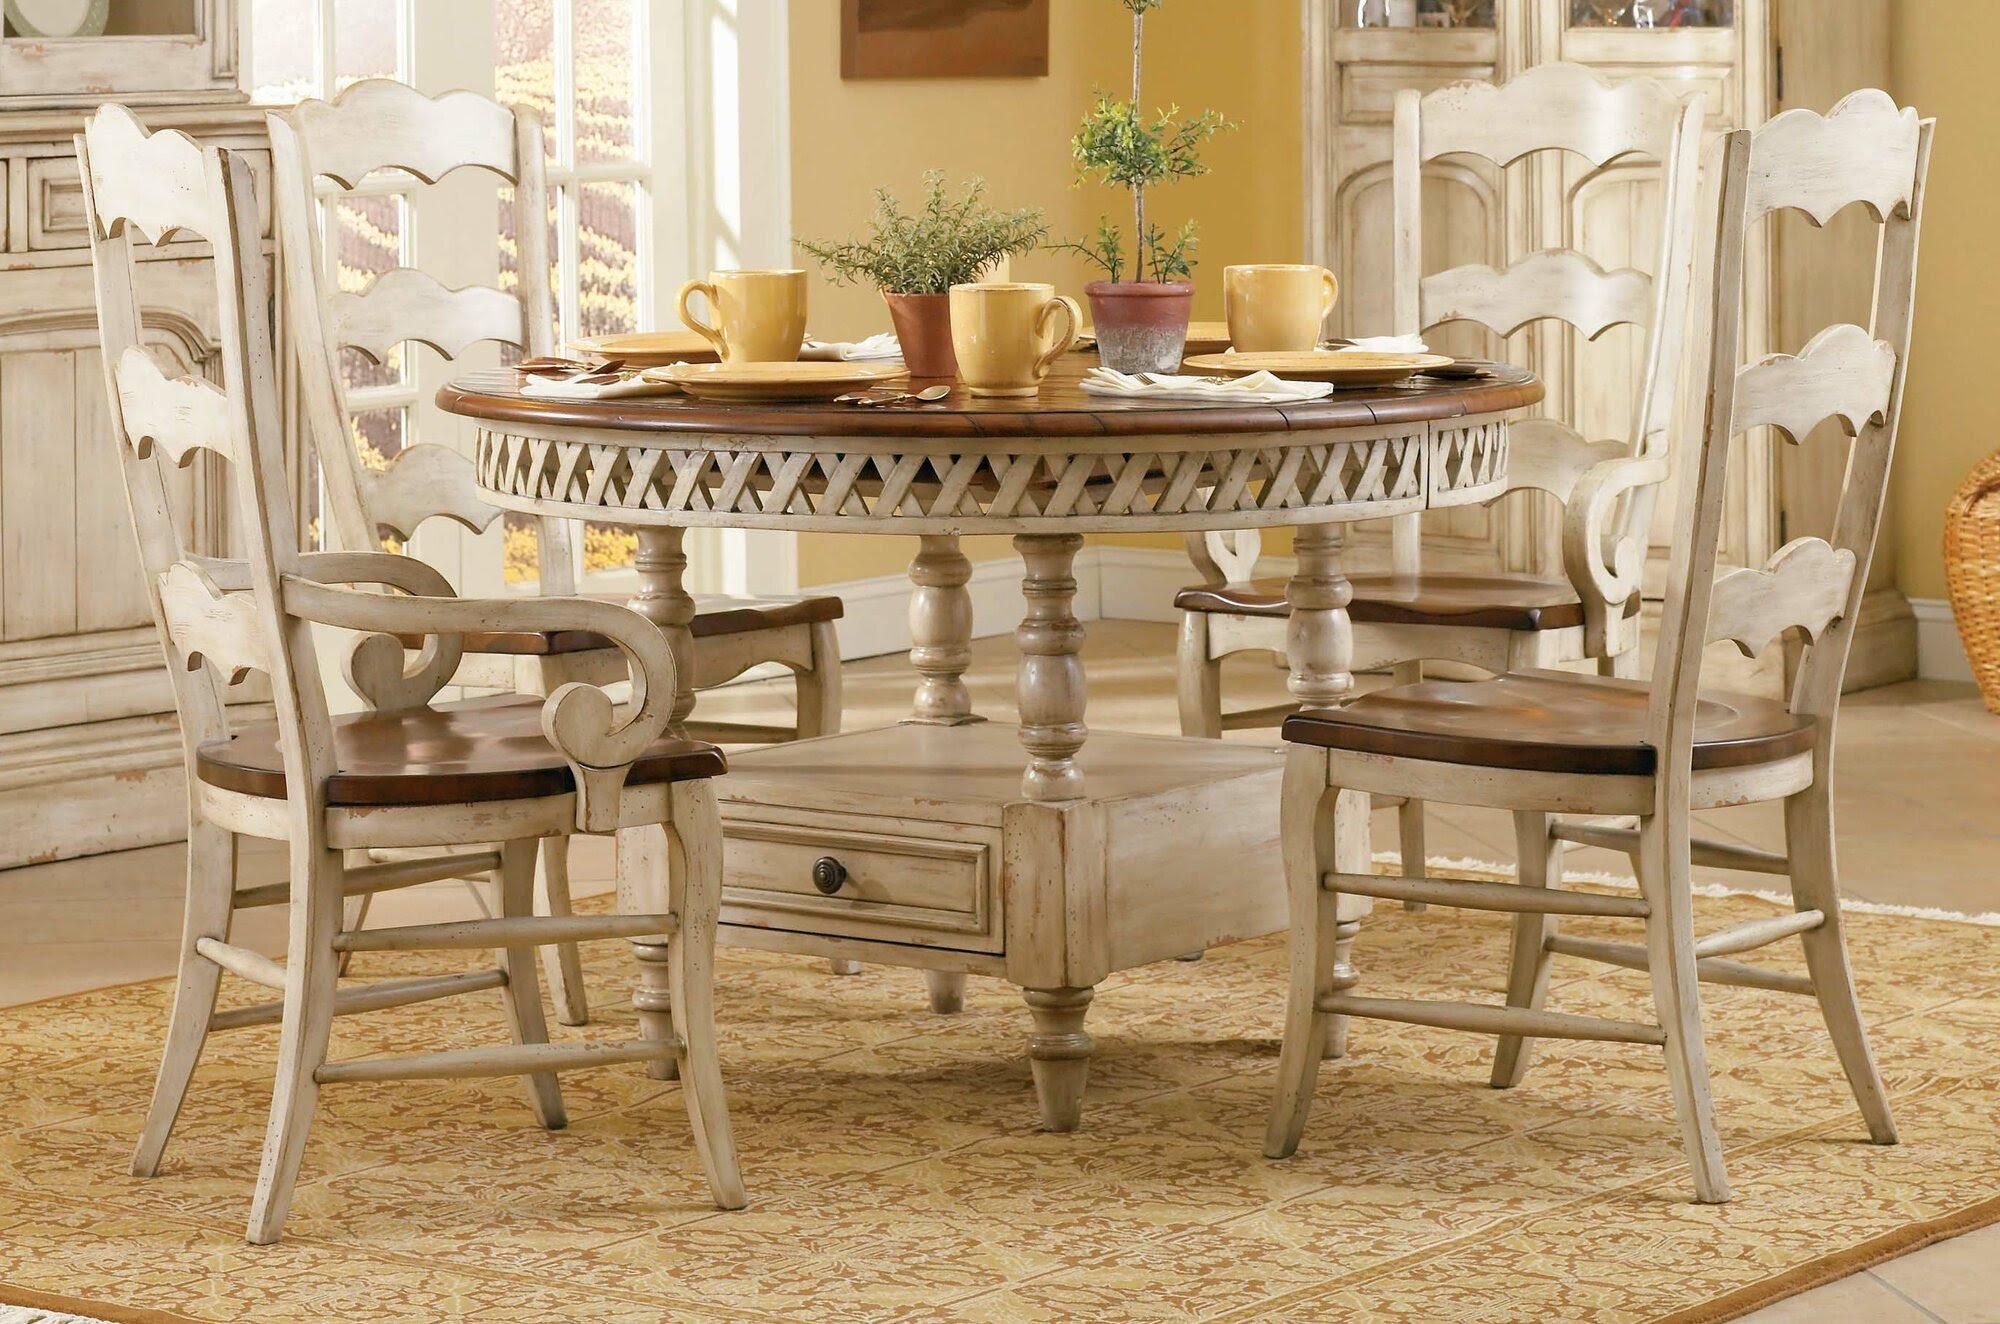 Hooker Furniture 479-75-201 - Summerglen 48